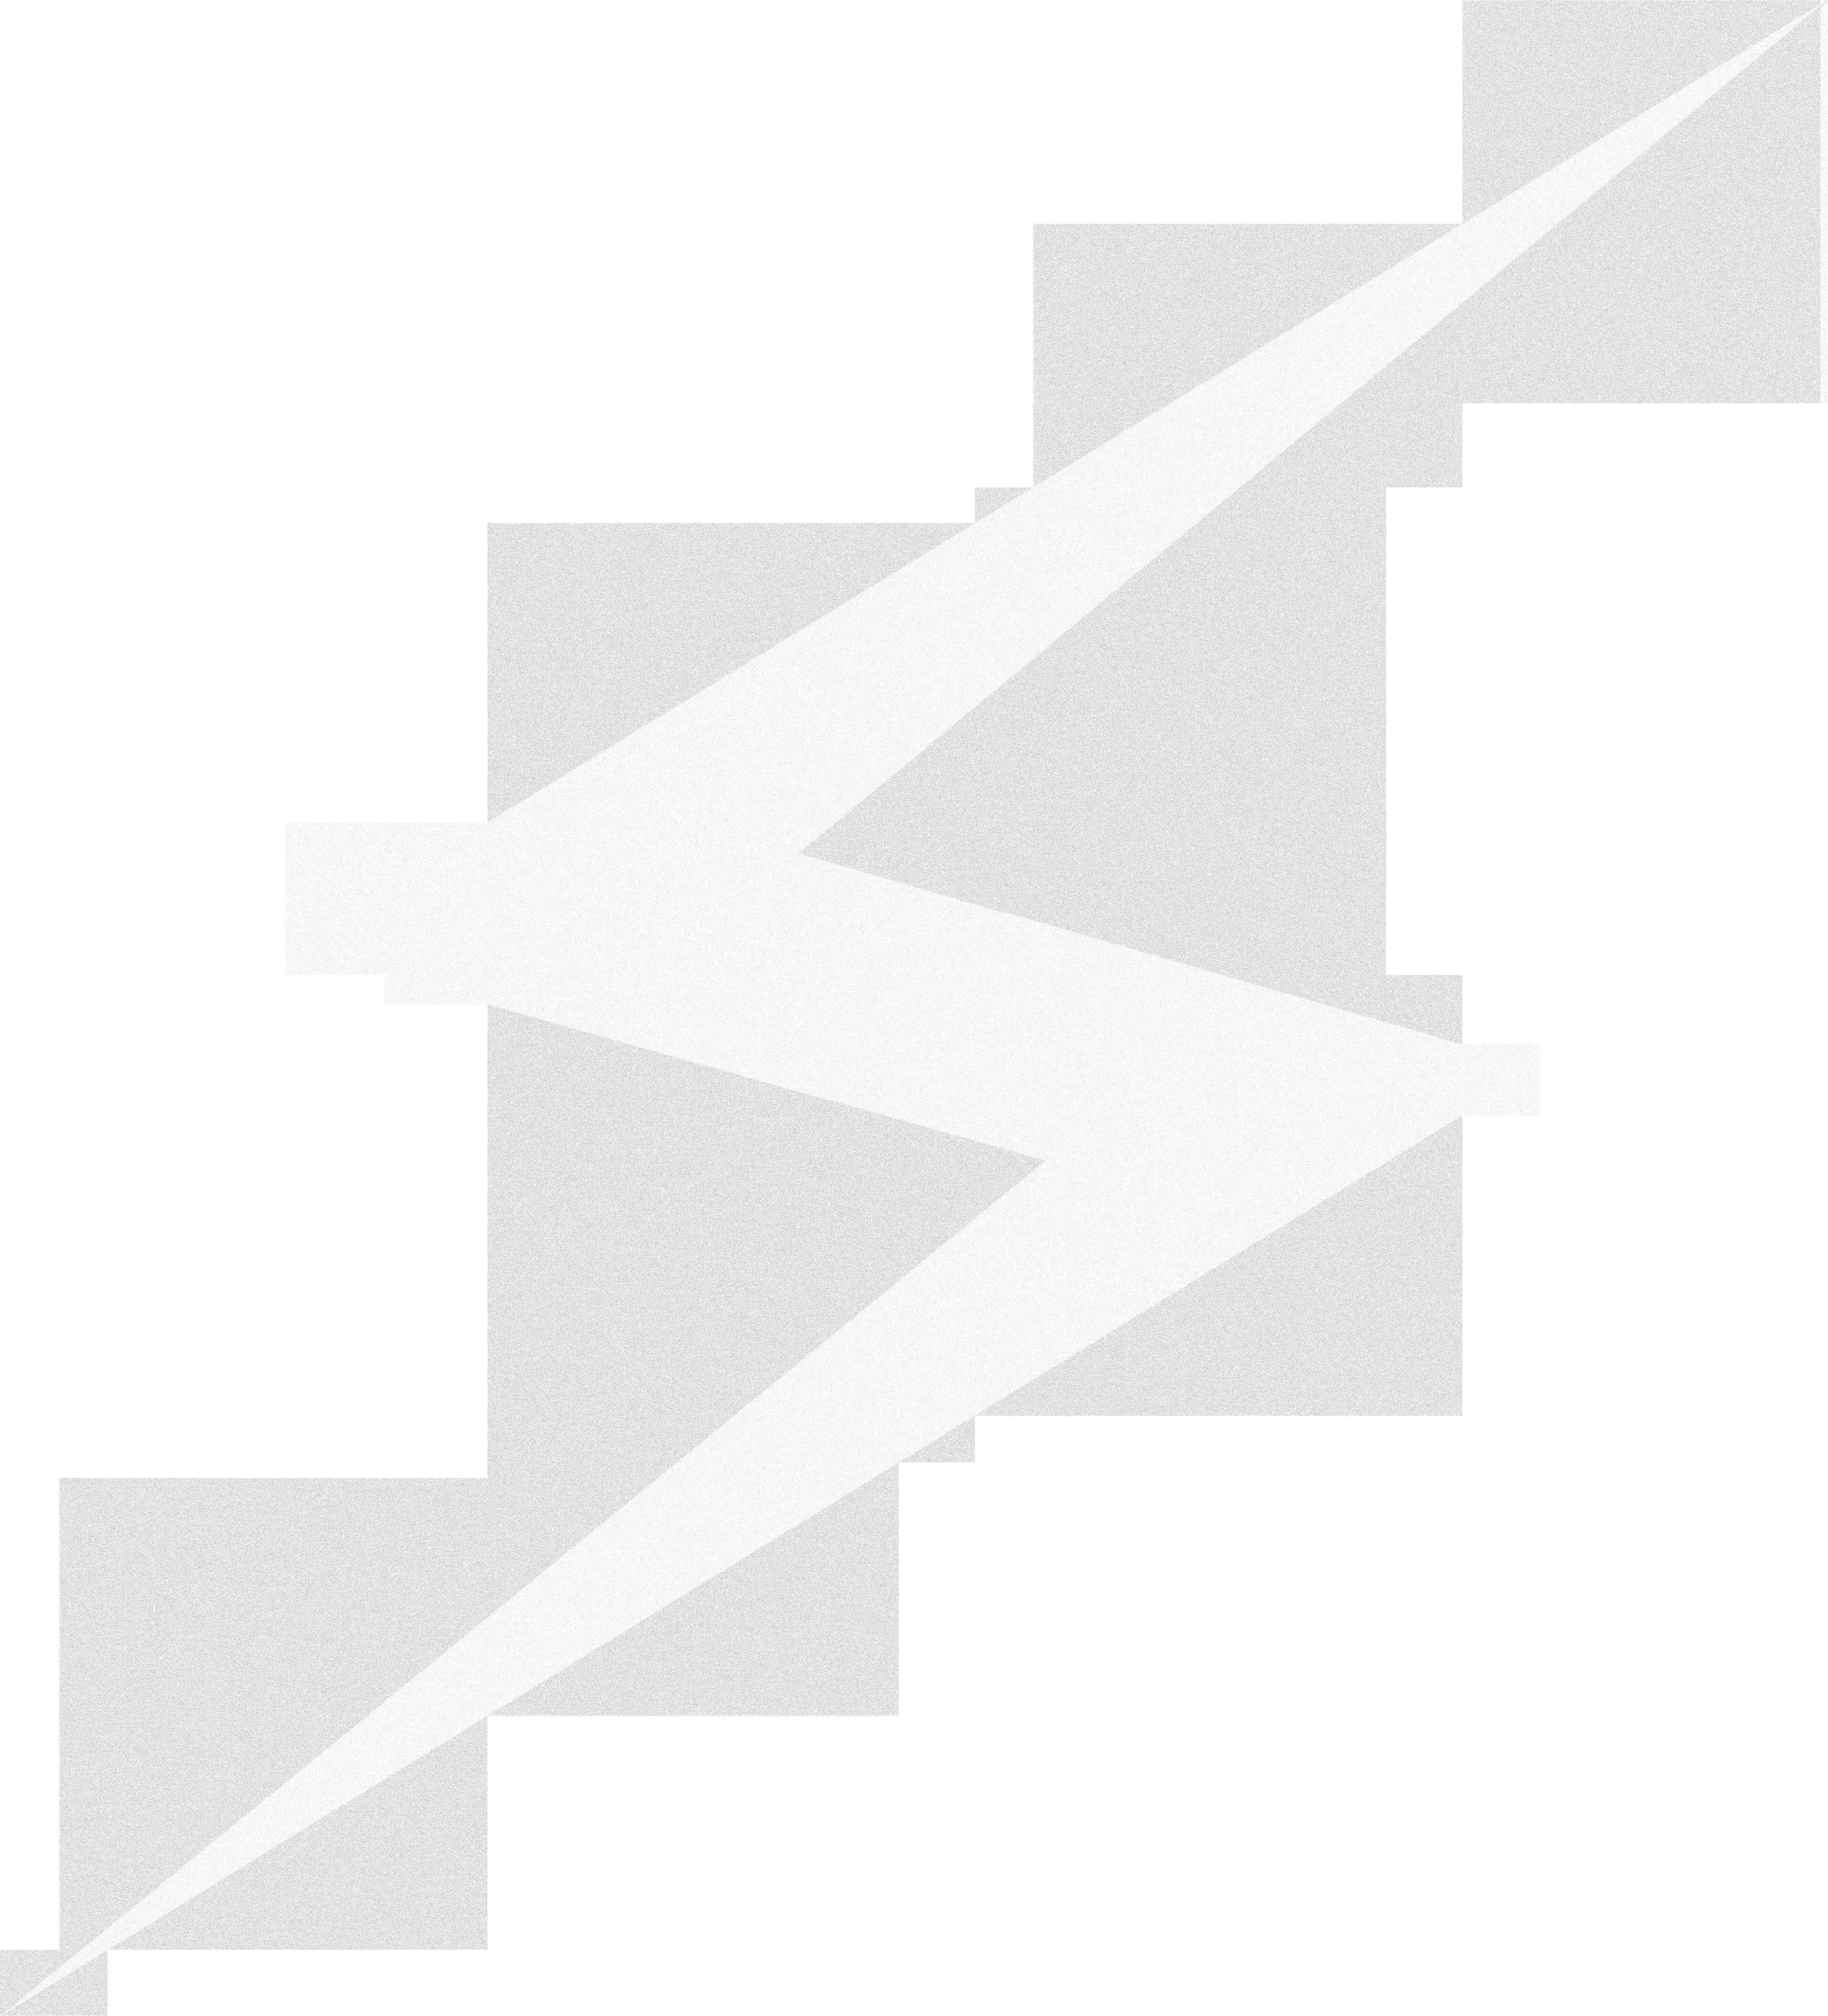 Shockbyte White Logomark